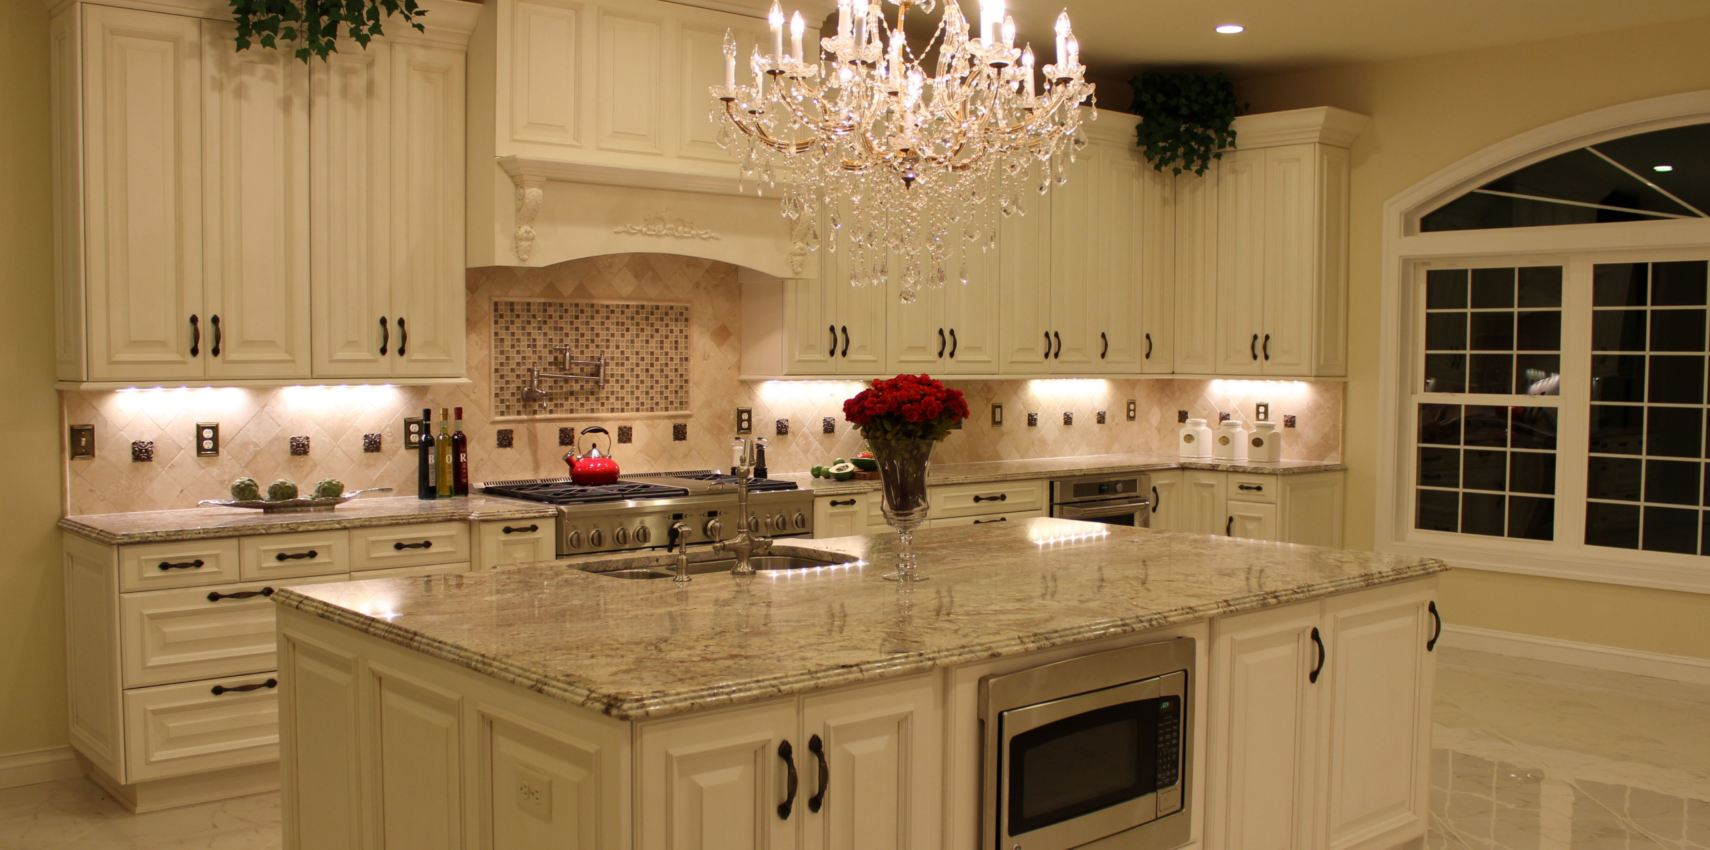 Grandior Kitchens | Designing a kosher kitchen with careful ...